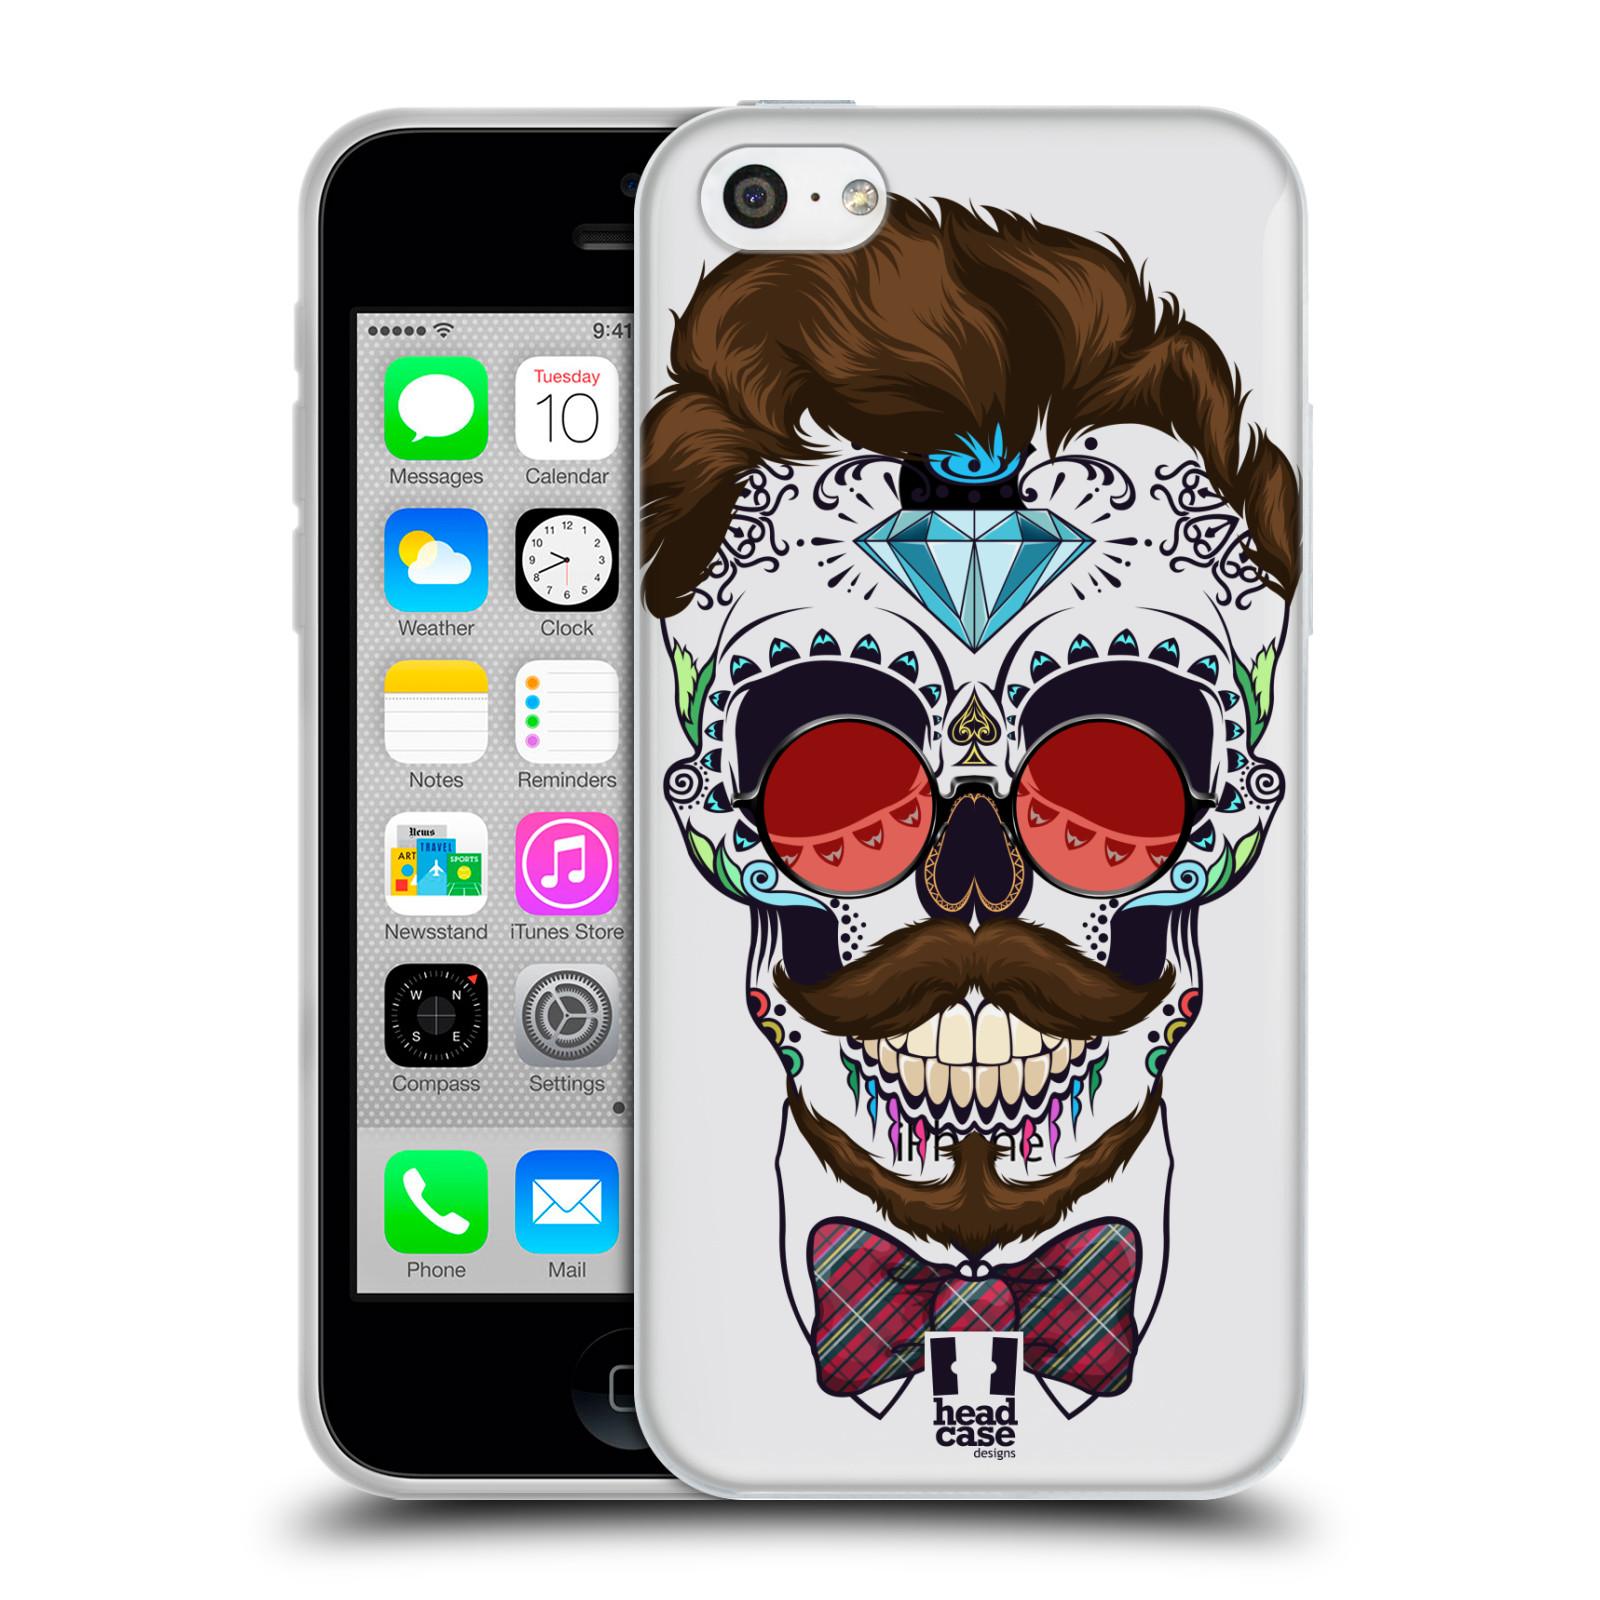 Silikonové pouzdro na mobil Apple iPhone 5C - Head Case - Lebka hipstra